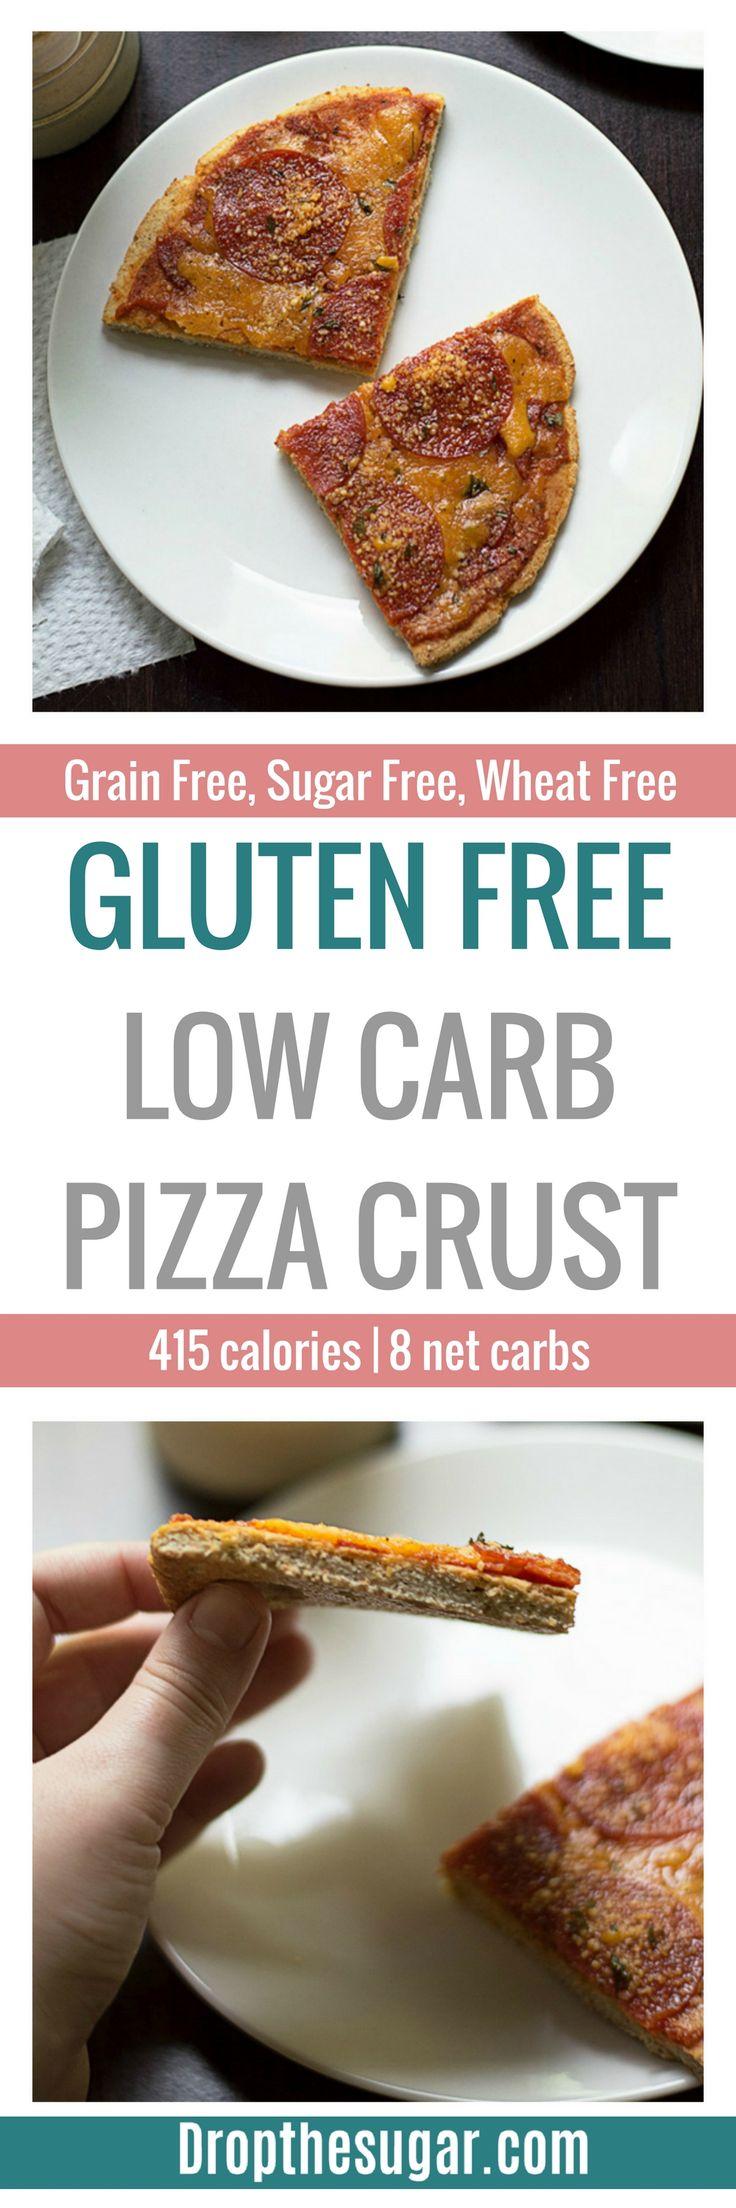 Gluten Free Low Carb Pizza Crust | a coconut flour pizza crust recipe ...